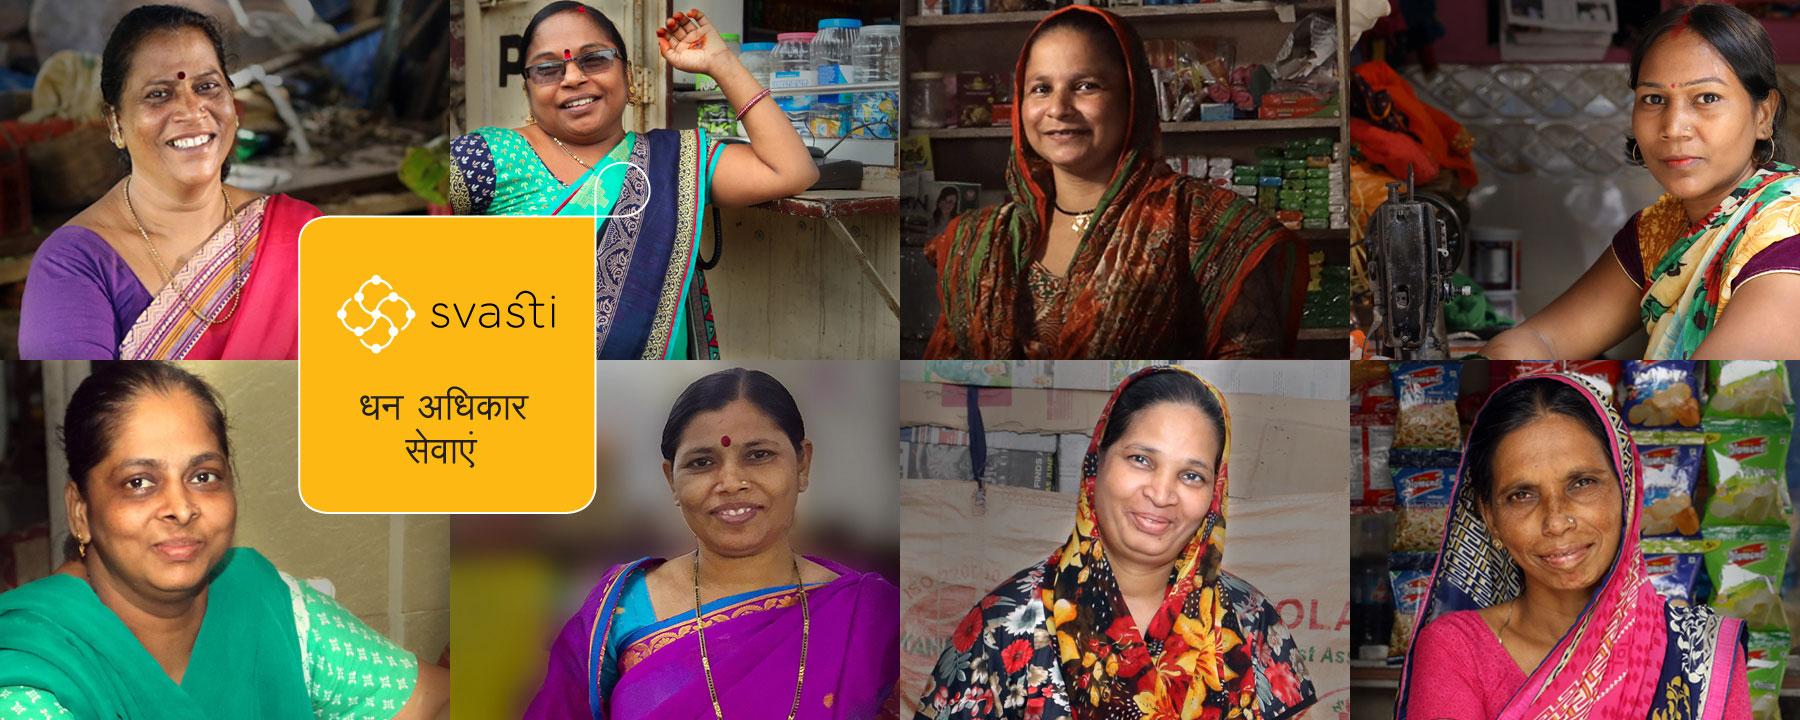 Svasti Microfinance | धन अधिकार सेवाएं